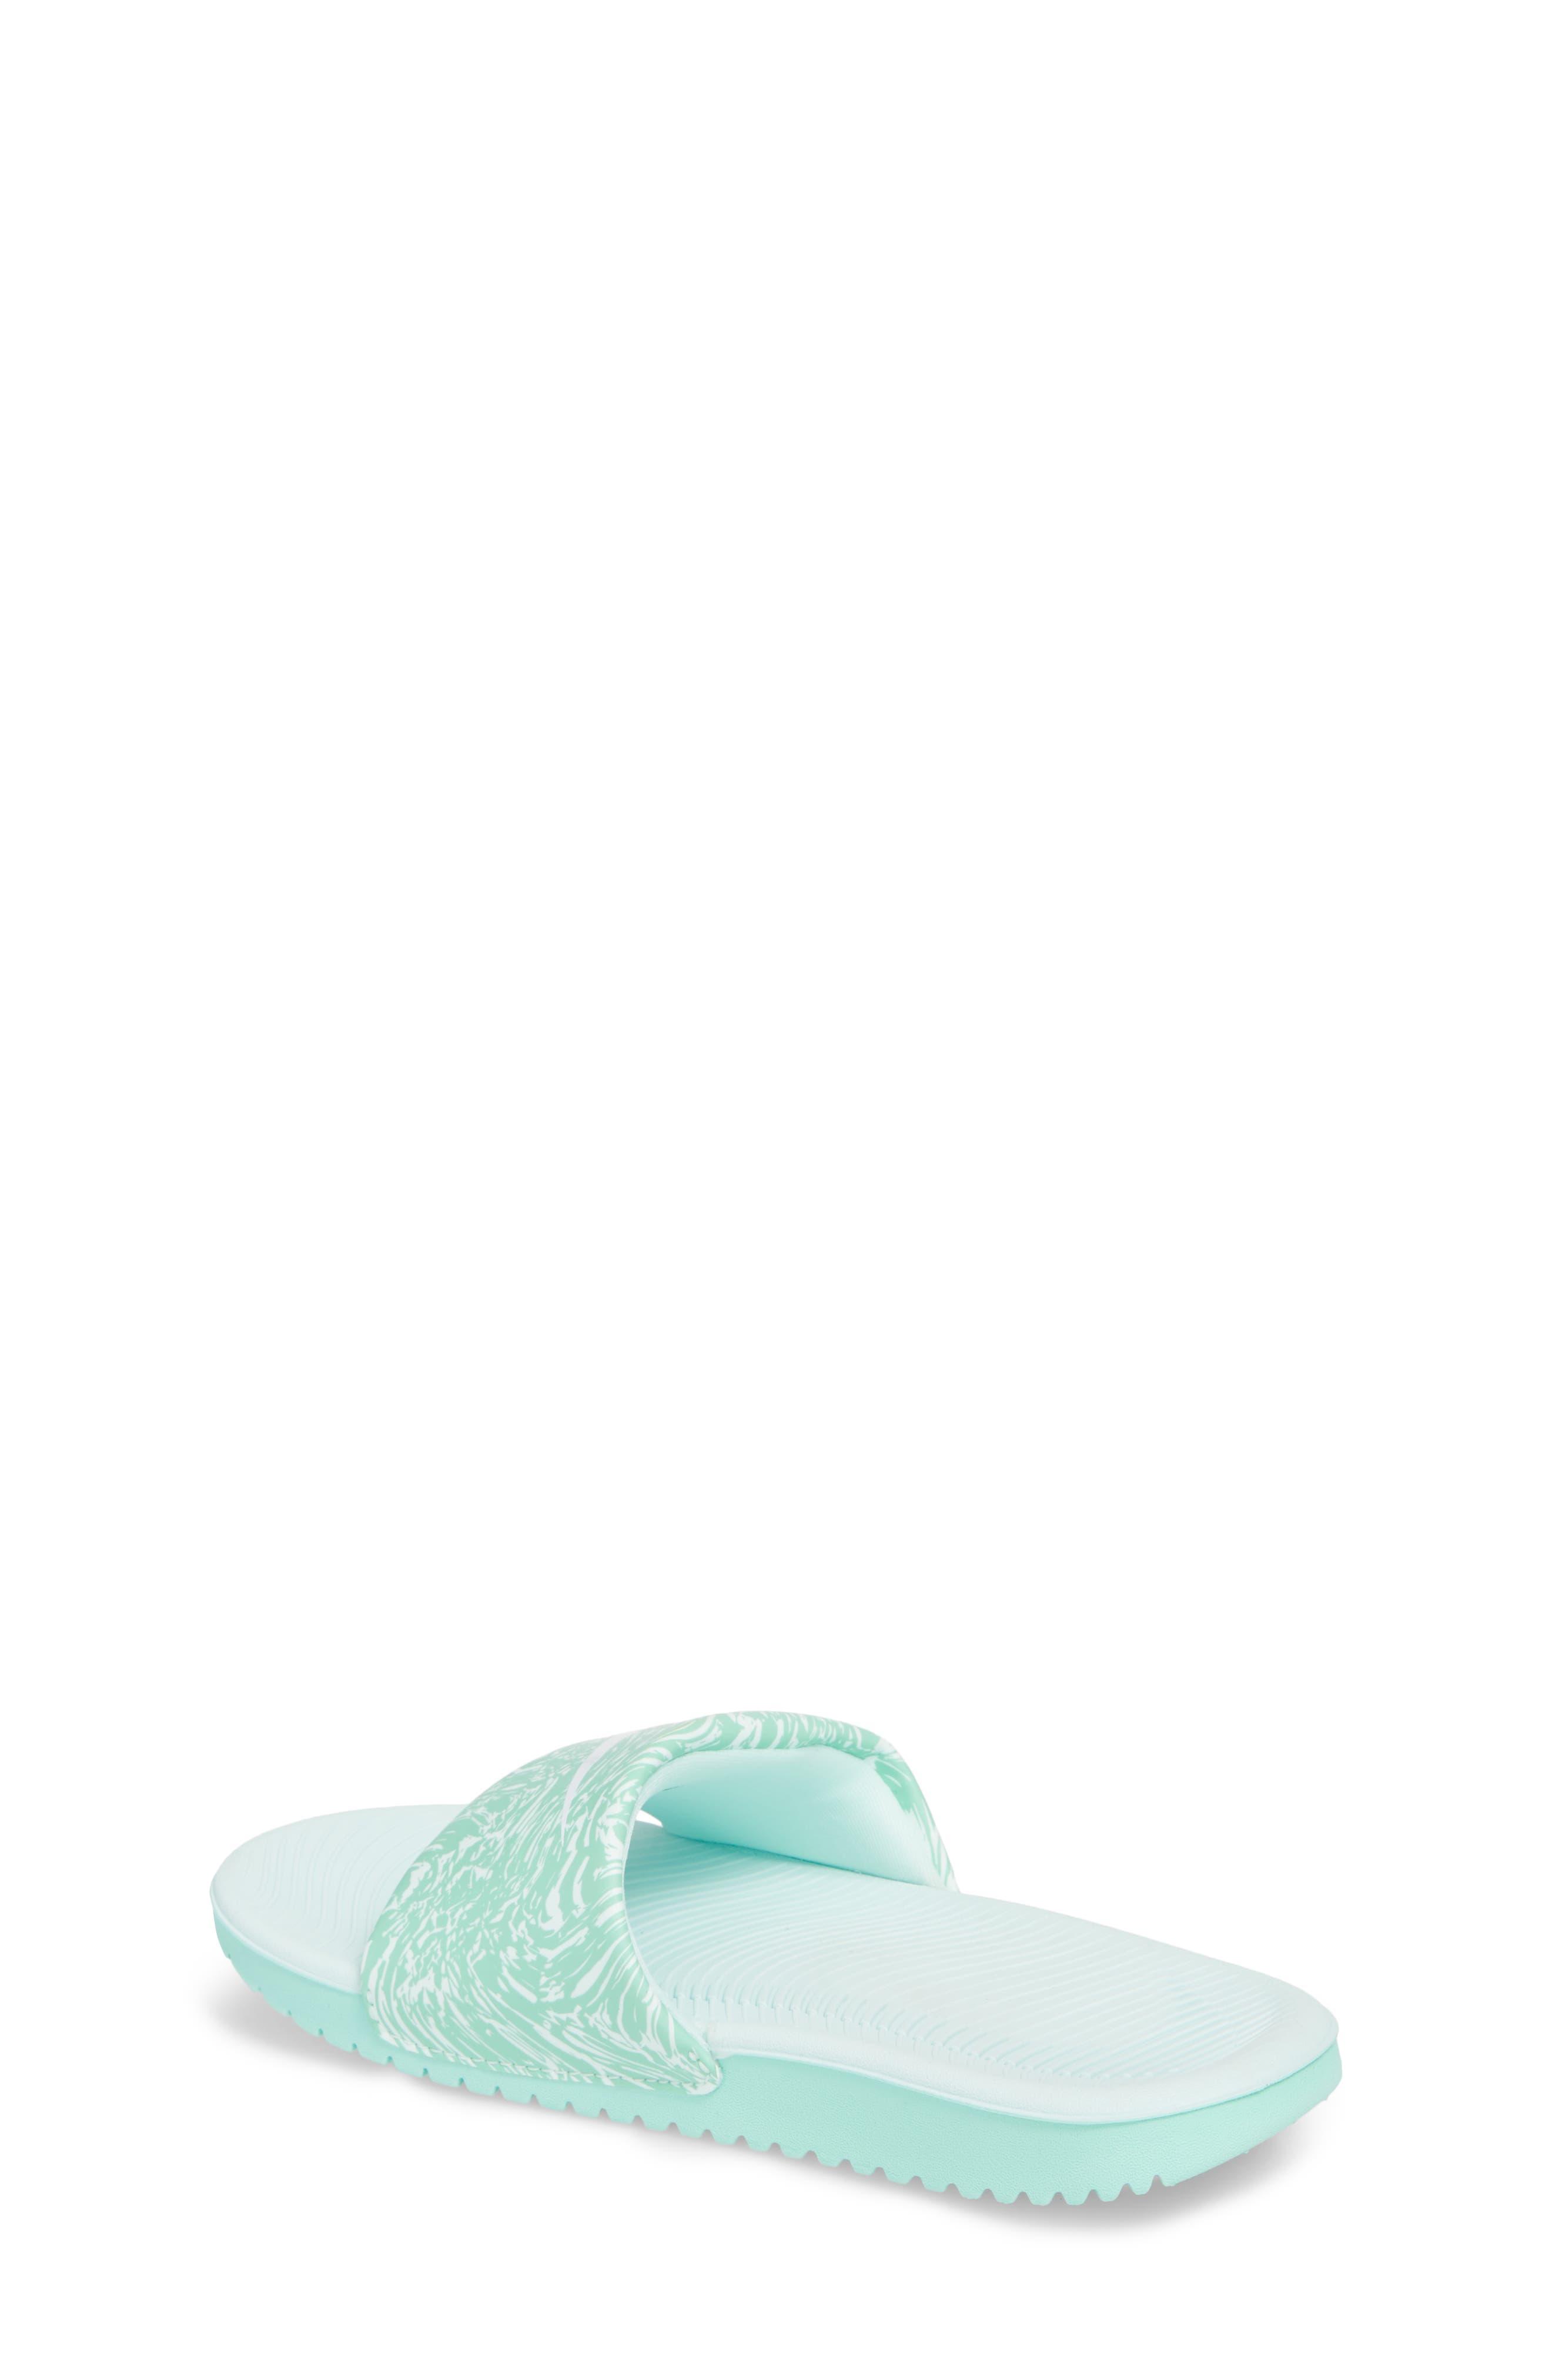 'Kawa' Print Slide Sandal,                             Alternate thumbnail 8, color,